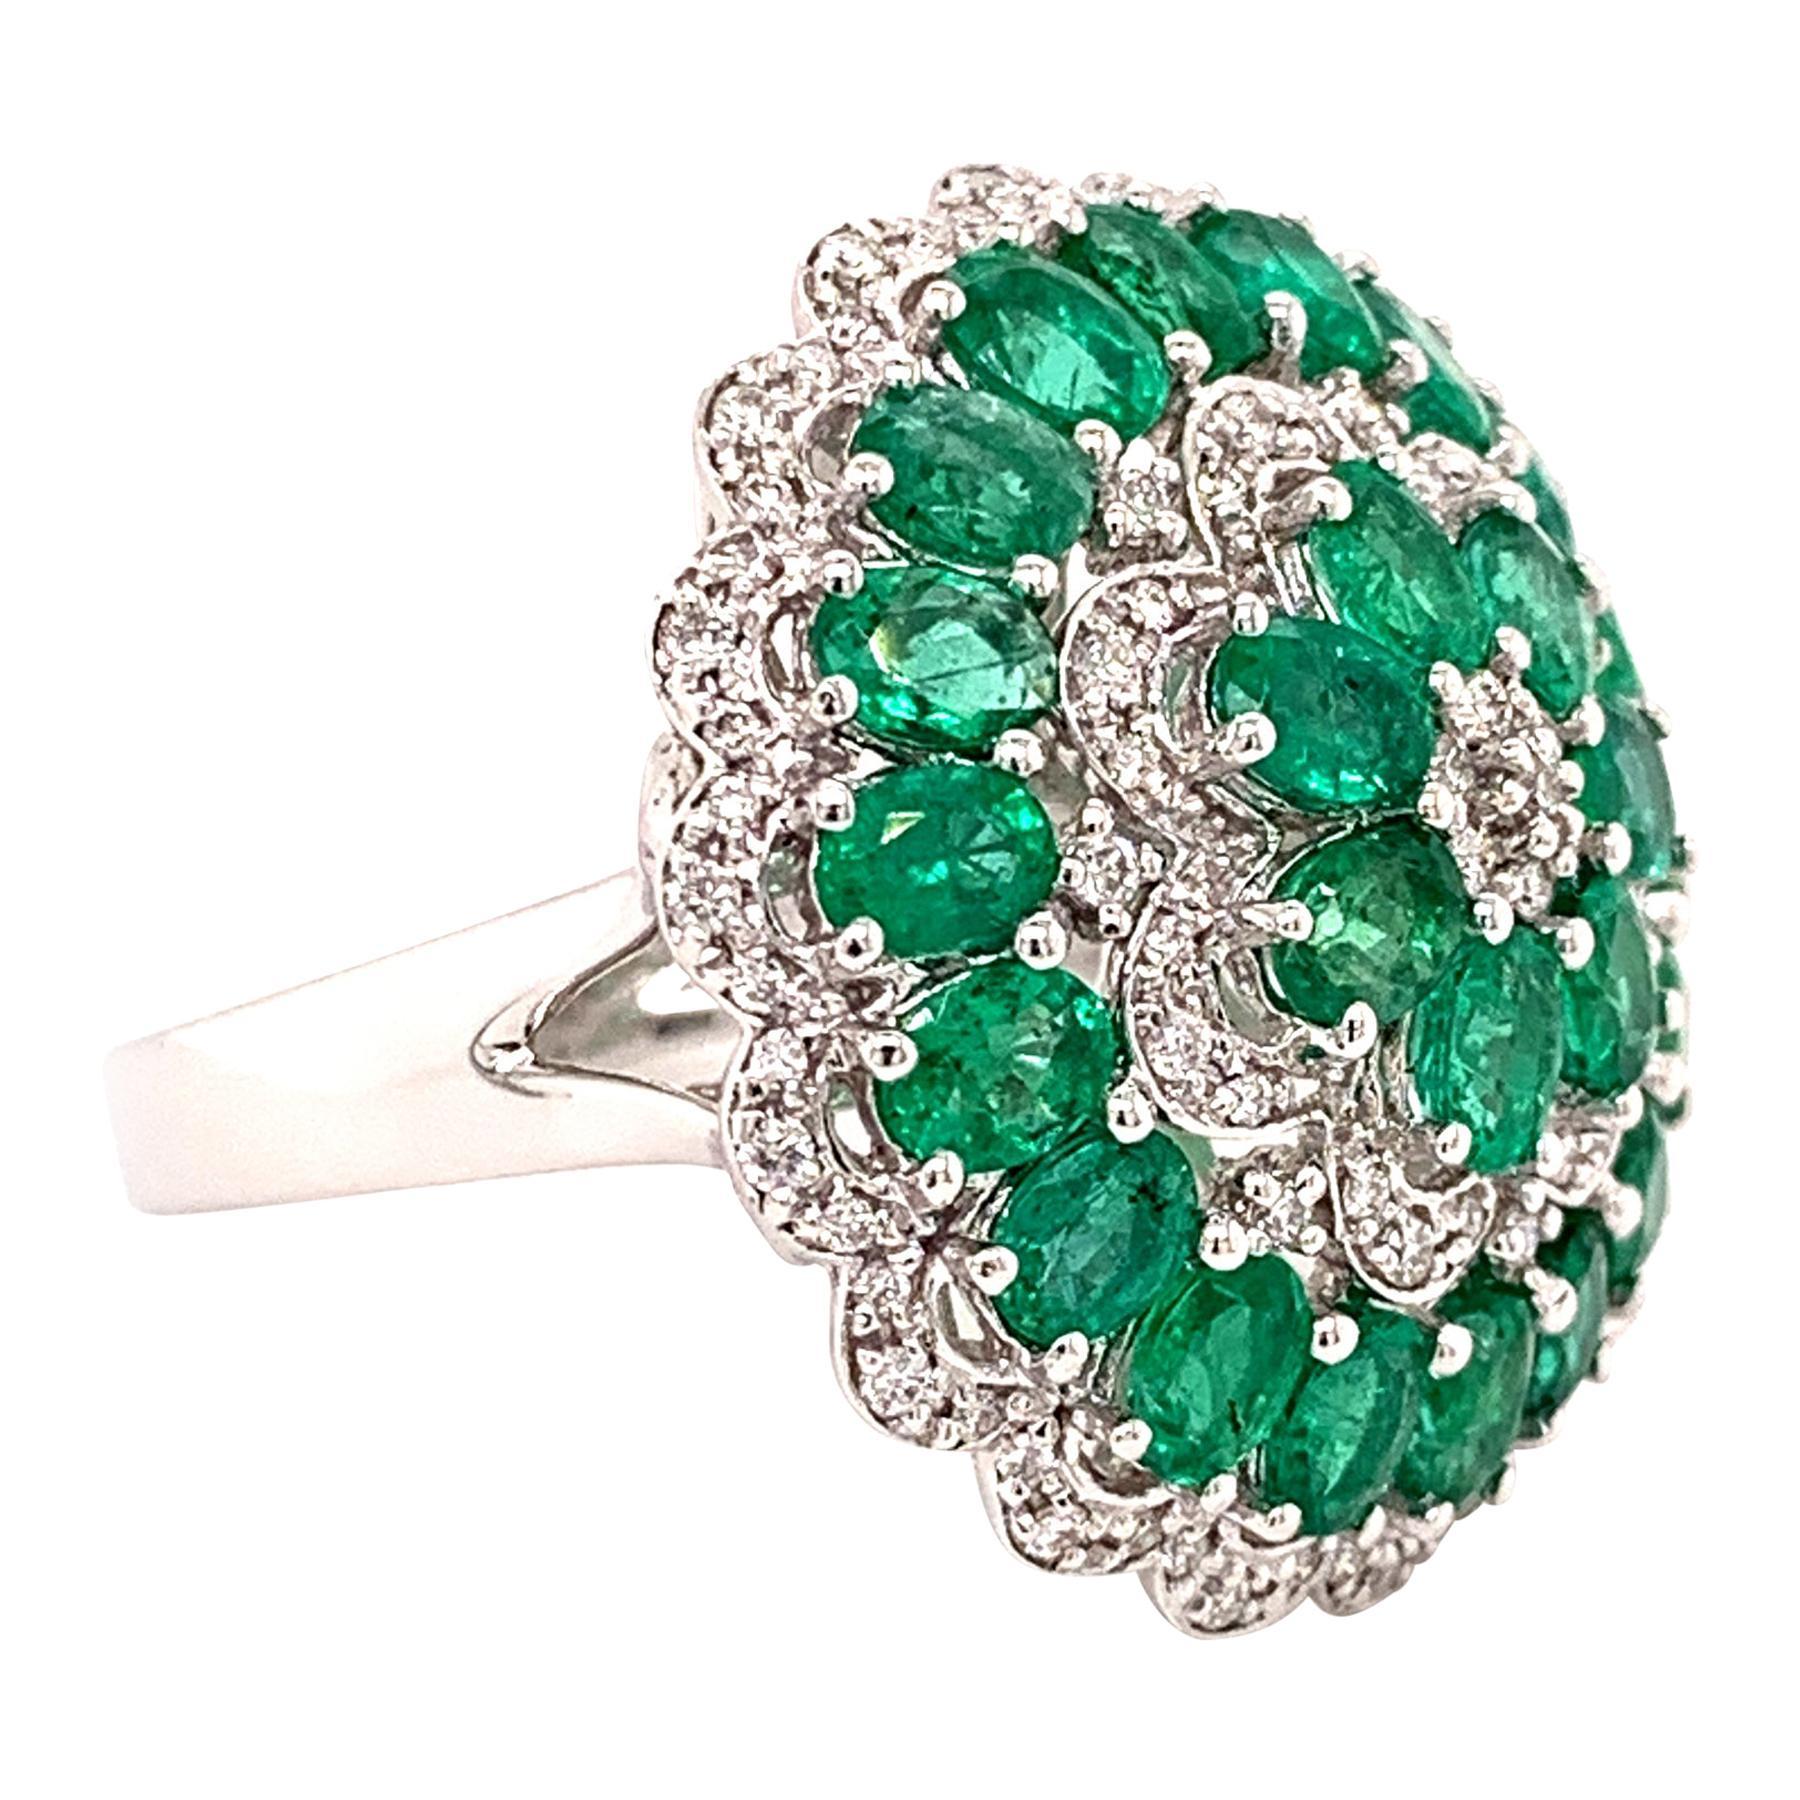 4.19 Carat Emerald Diamond Cocktail Ring